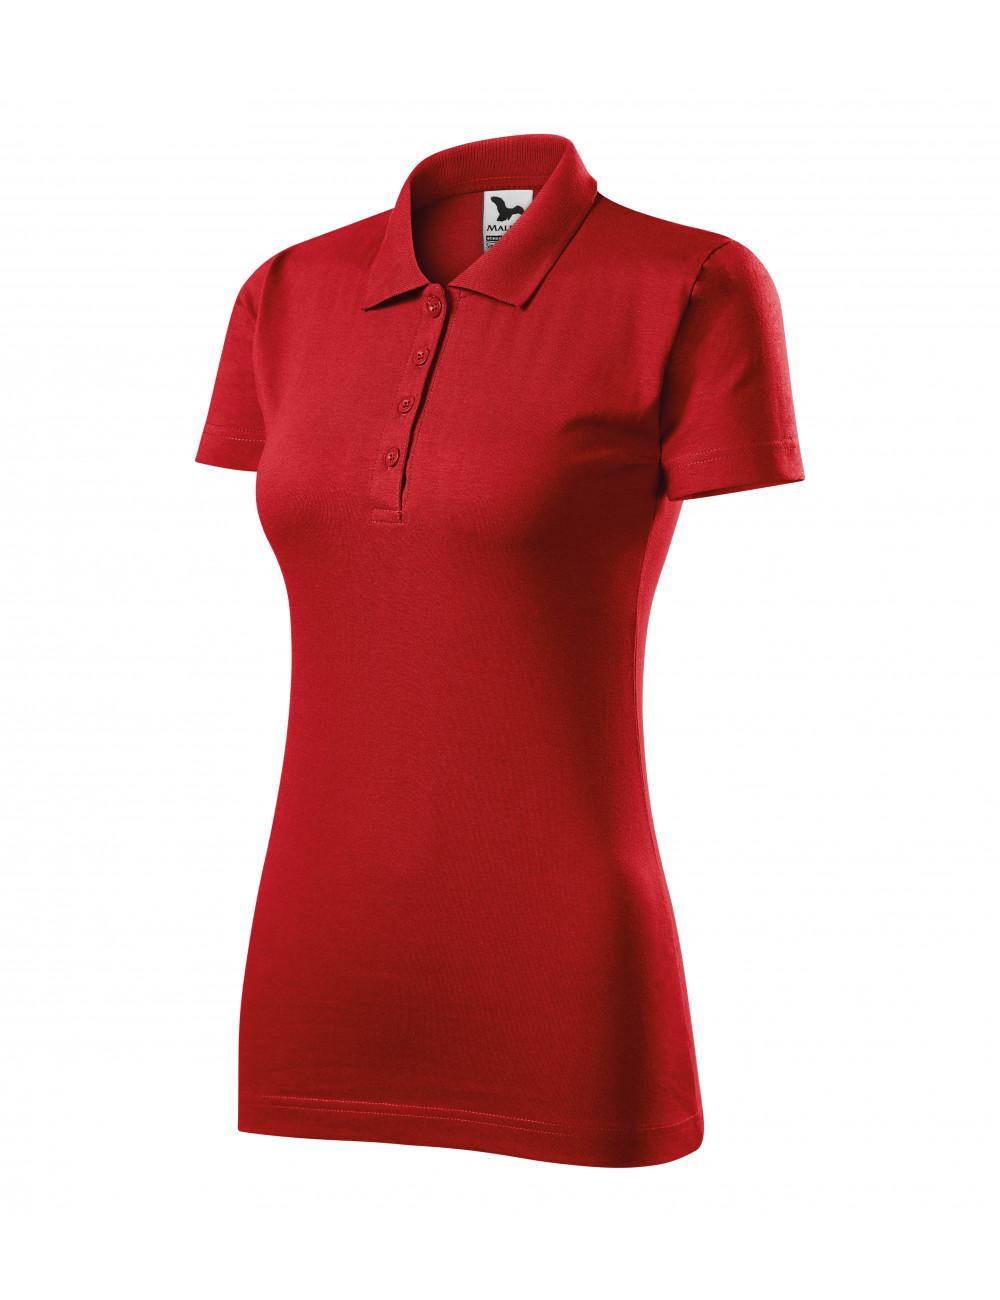 Adler MALFINI Koszulka polo damska Single J. 223 czerwony